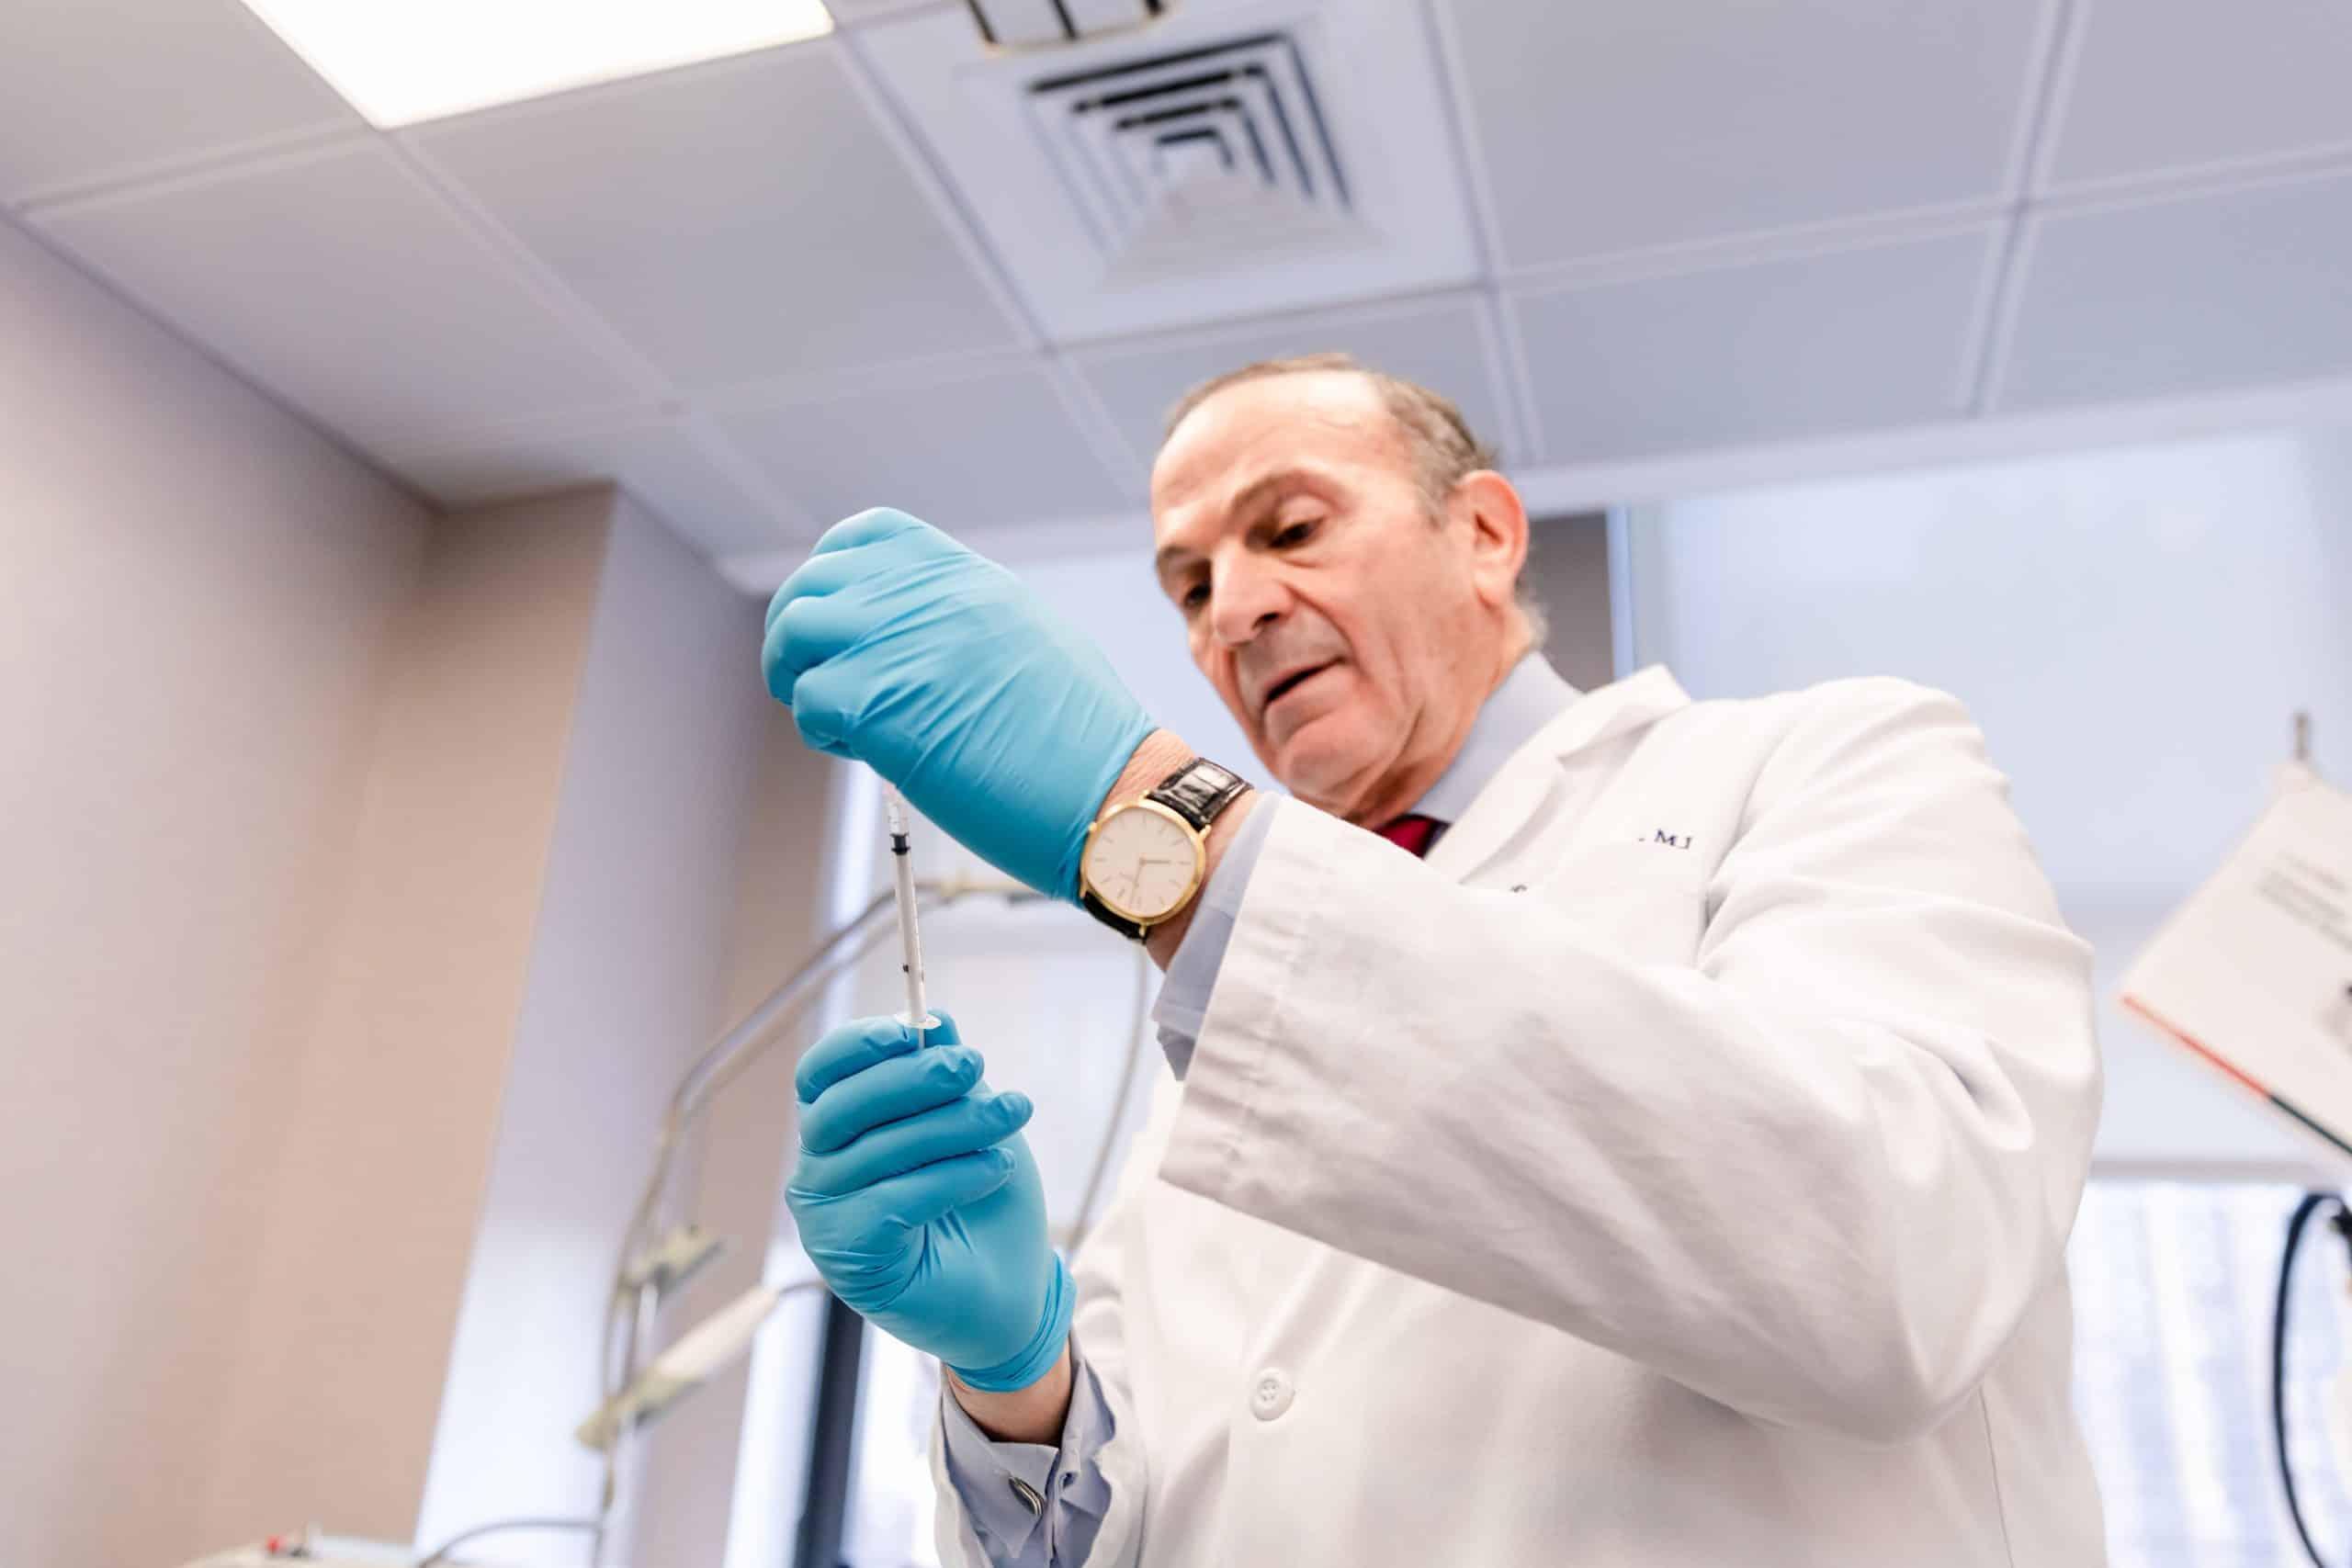 RHA filler for wrinkle treatment in NY